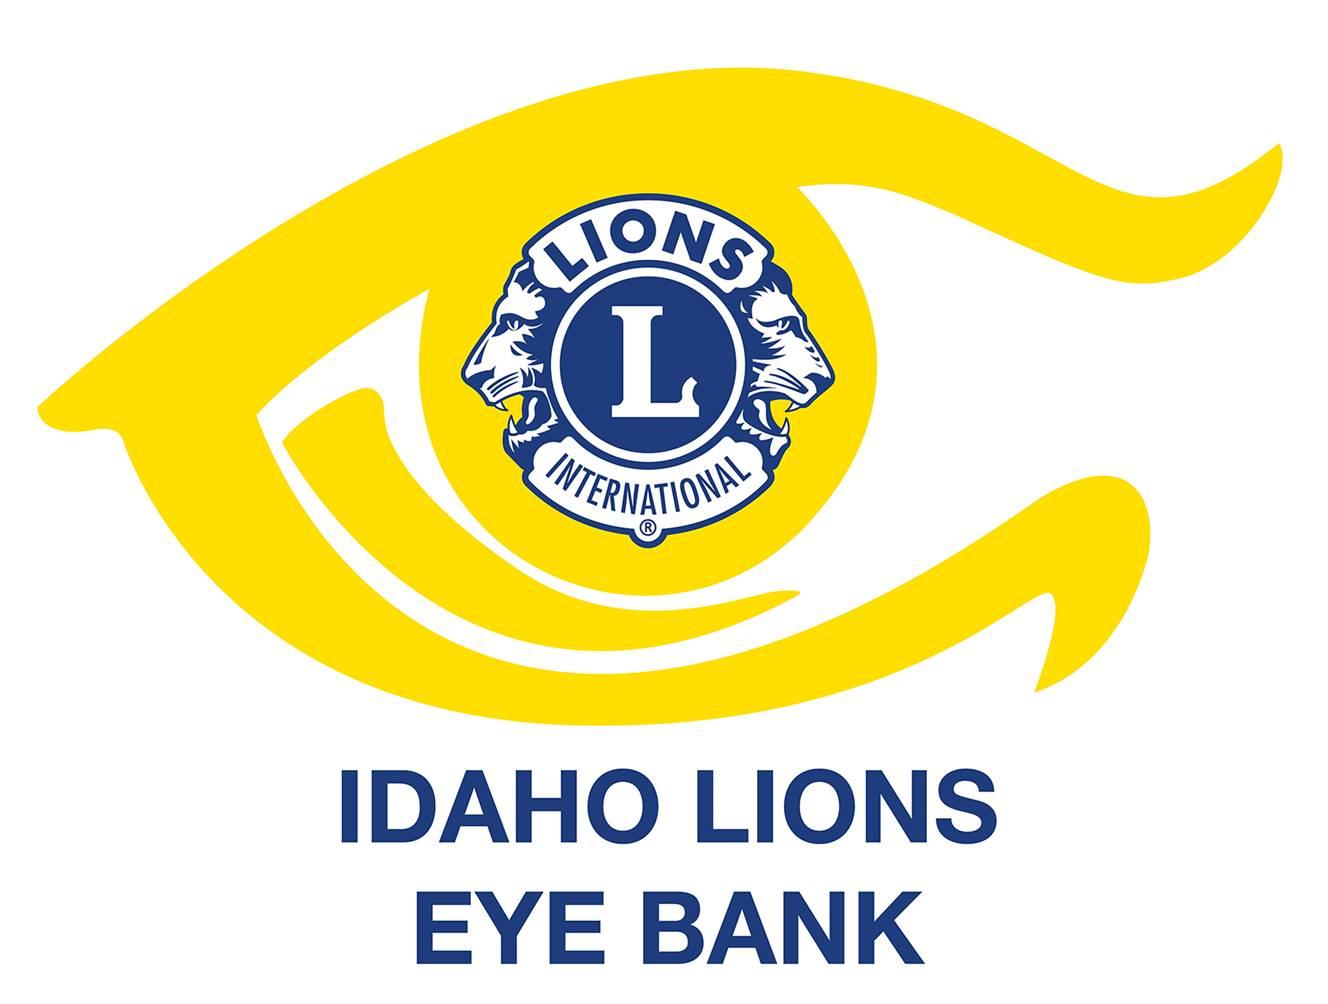 Idaho Lions Eye Bank